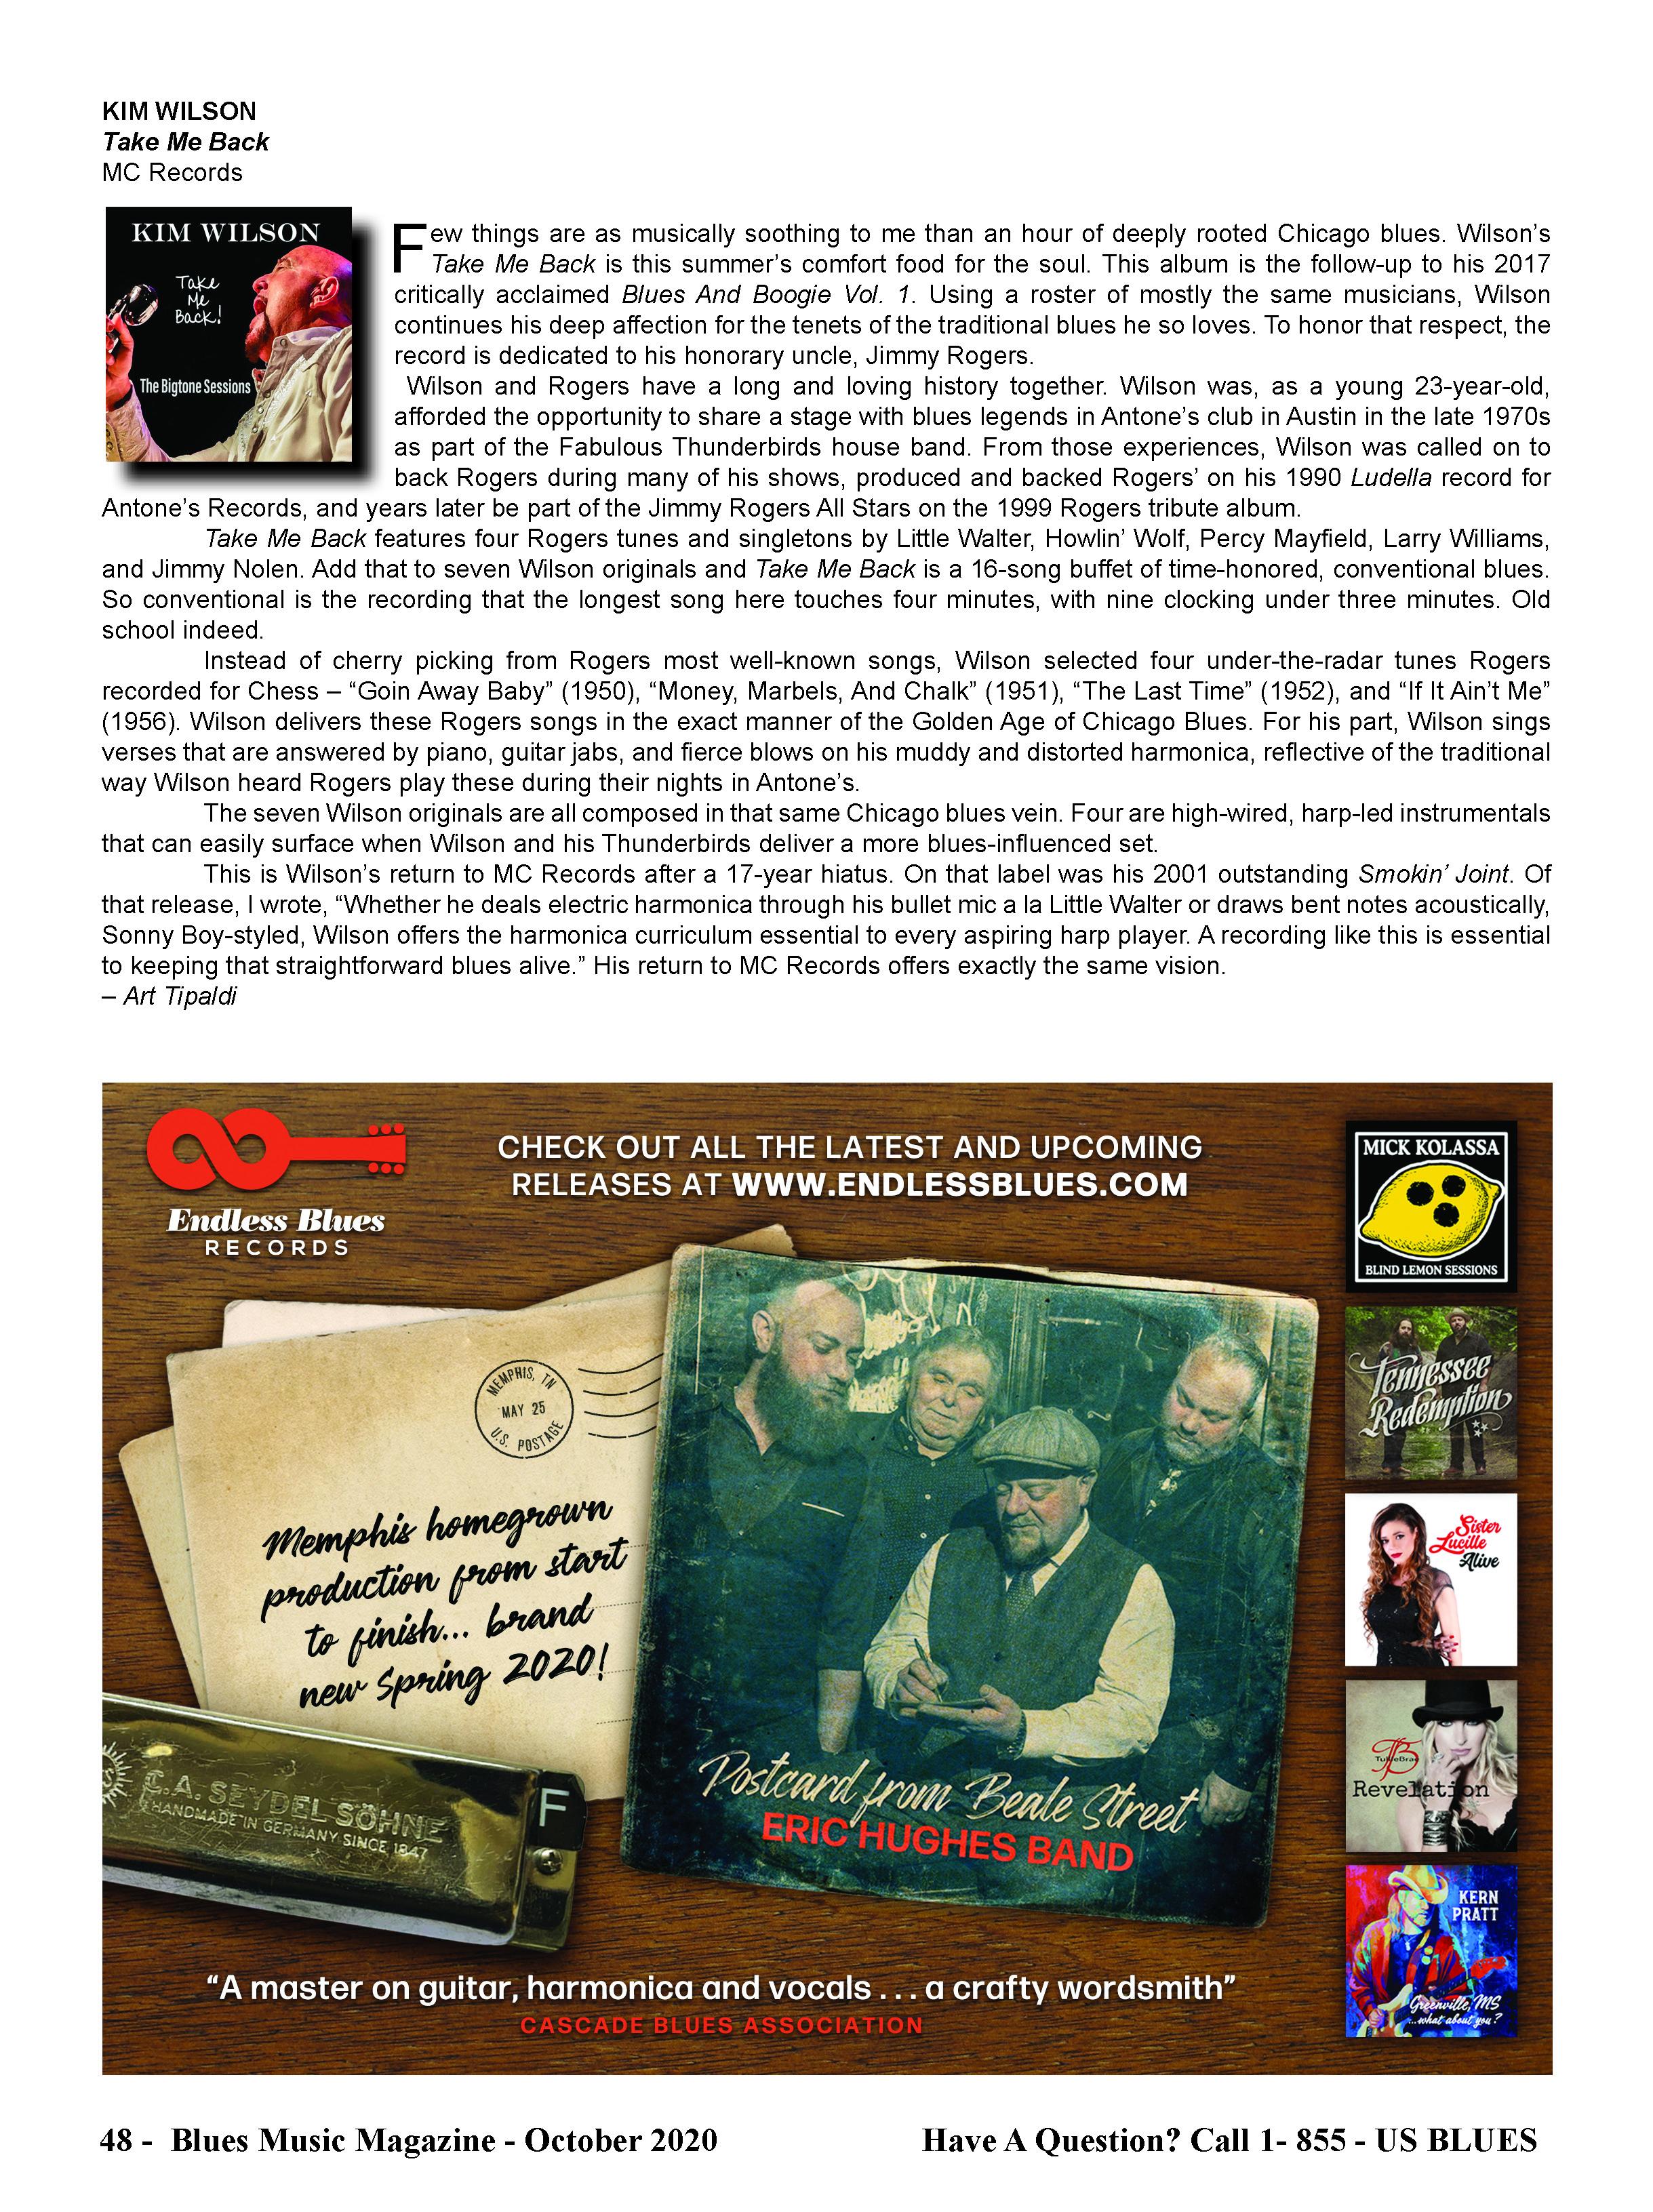 blues-music-magazine-fall-2020-2748.jpg